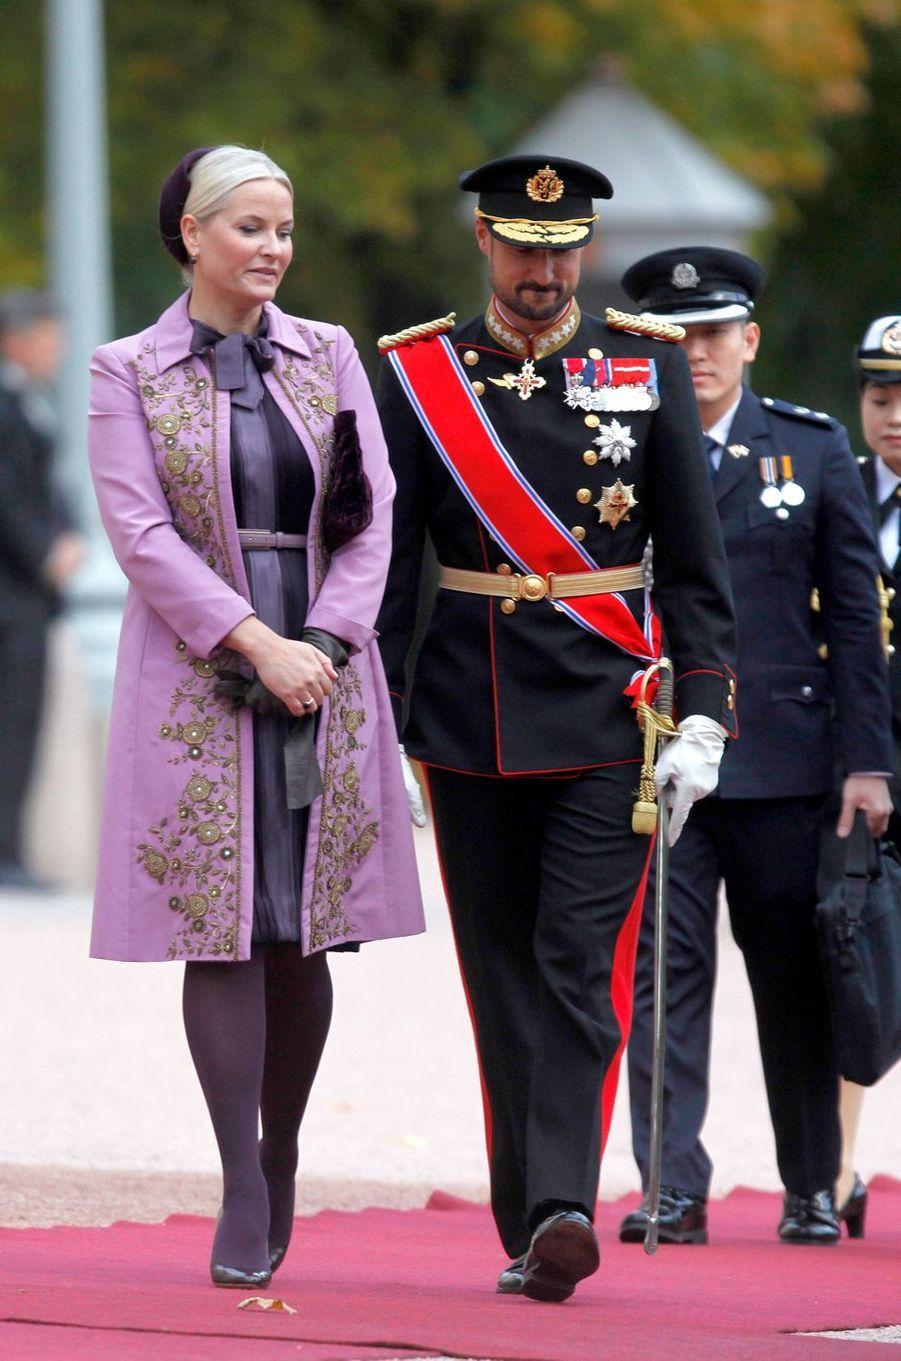 La princesse Mette-Marit de Norvège dans un manteau Alberta Ferretti, le 10 octobre 2016